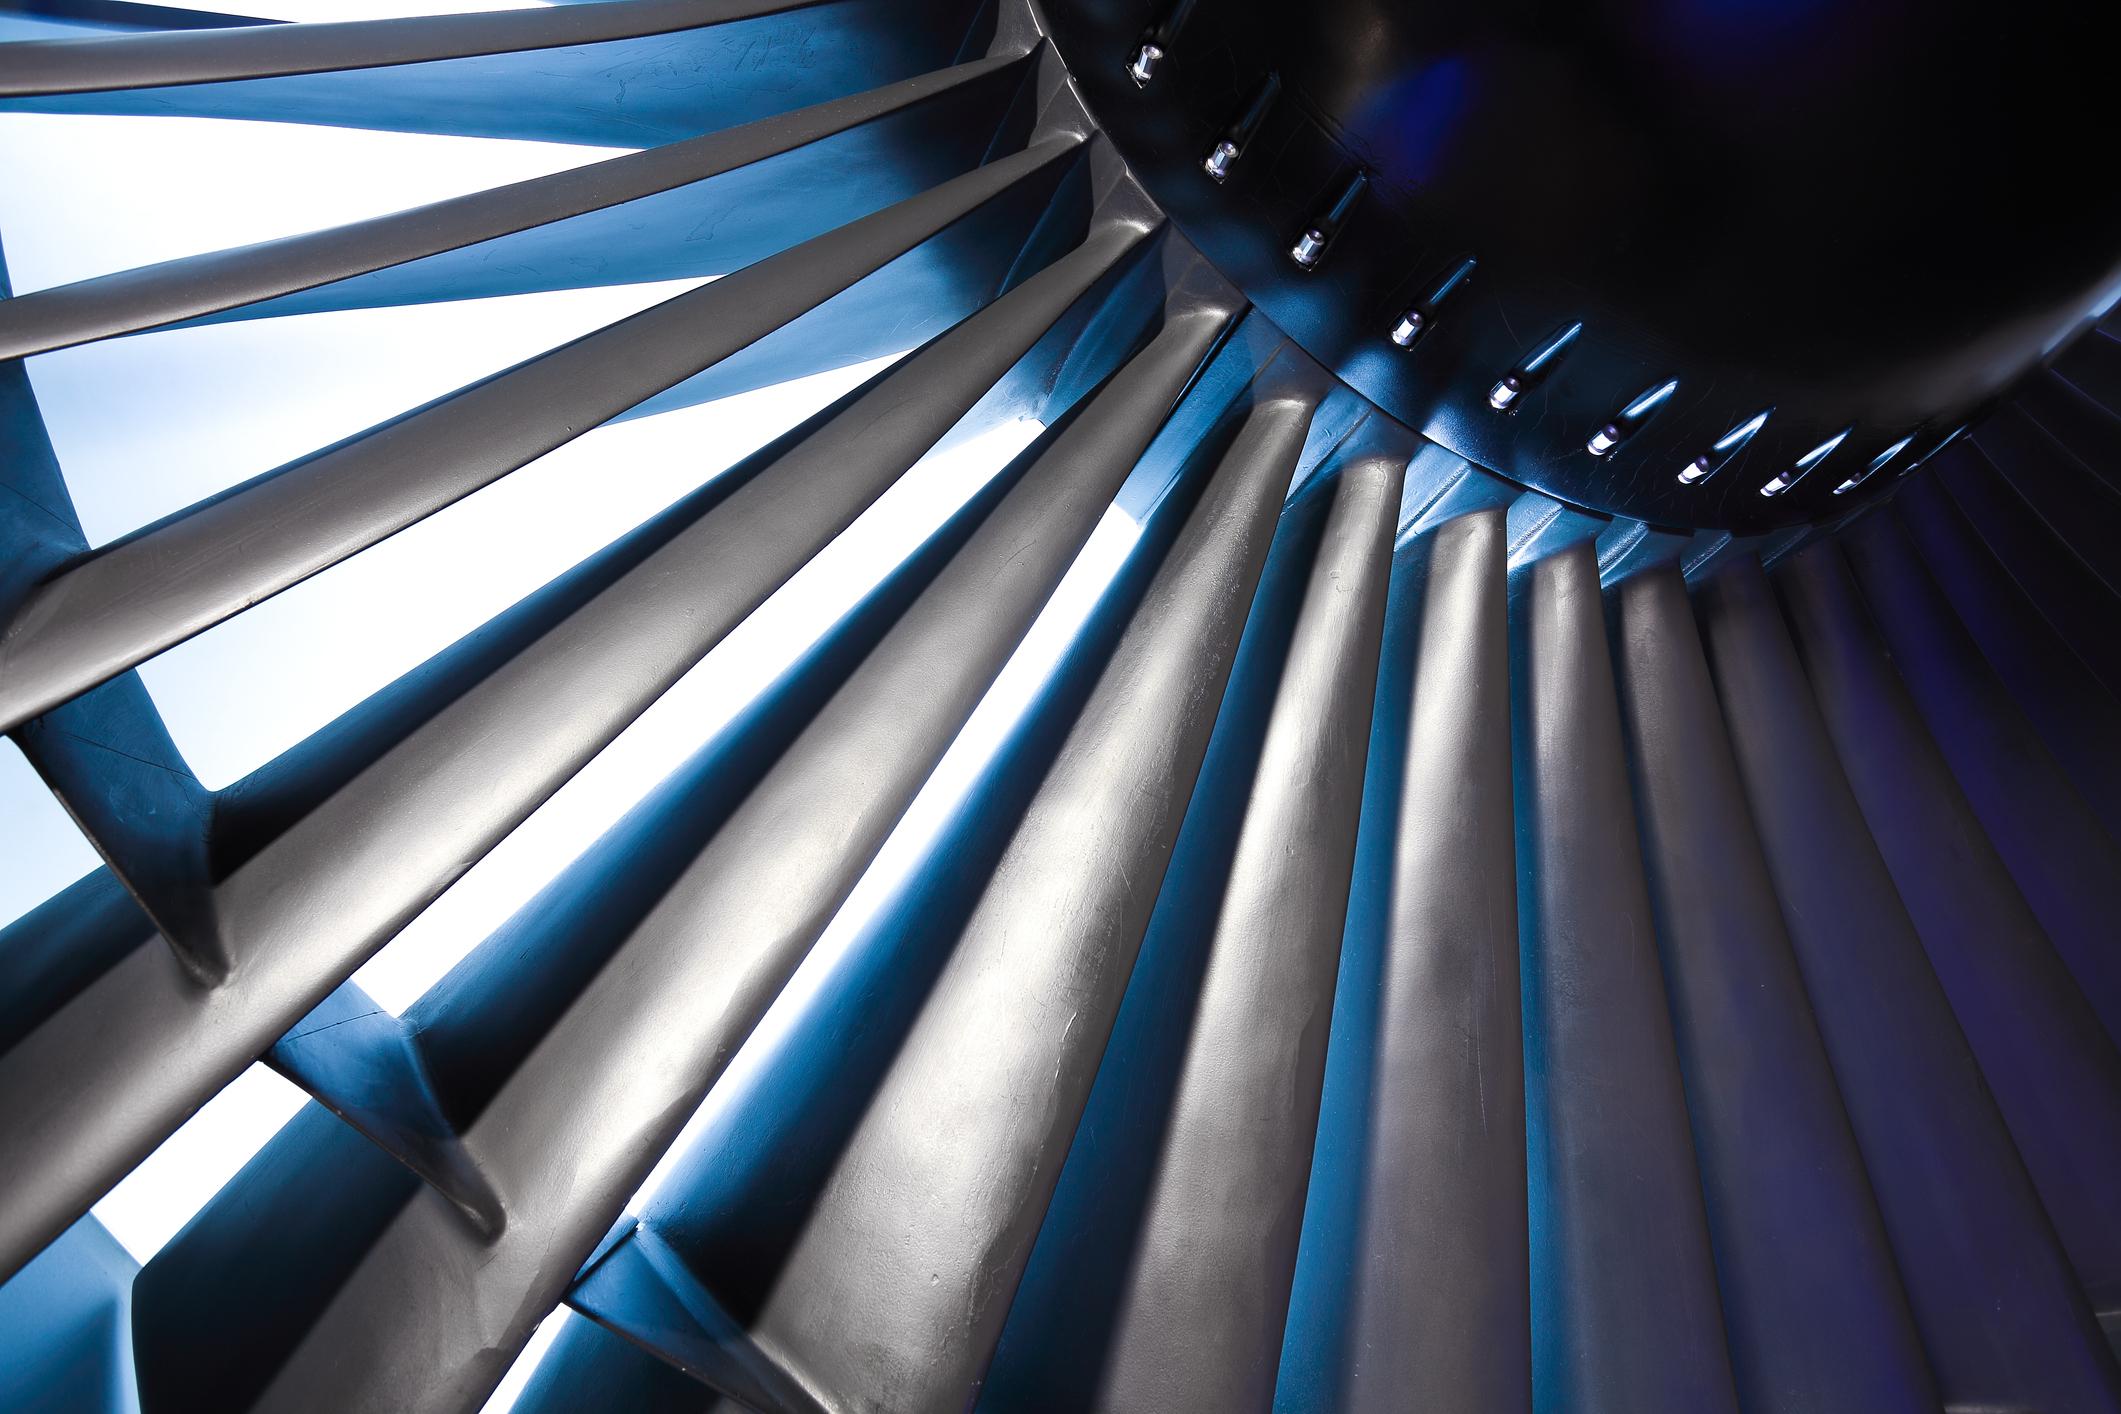 Close-up of a turbine.